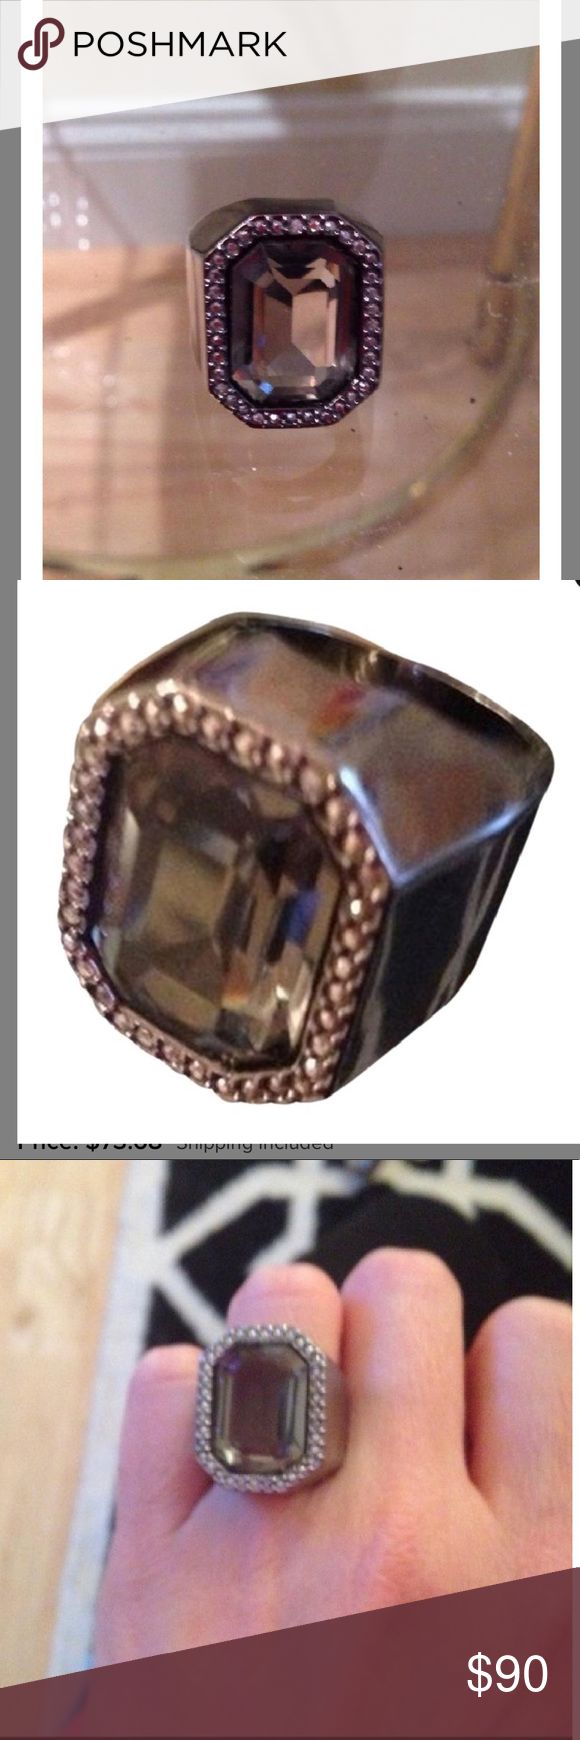 f4688f203 Swarovski Comet Meteor Black Crystal Pave Ring 5.5 Retail price $170.00.  Genuine/Authentic Swarovski